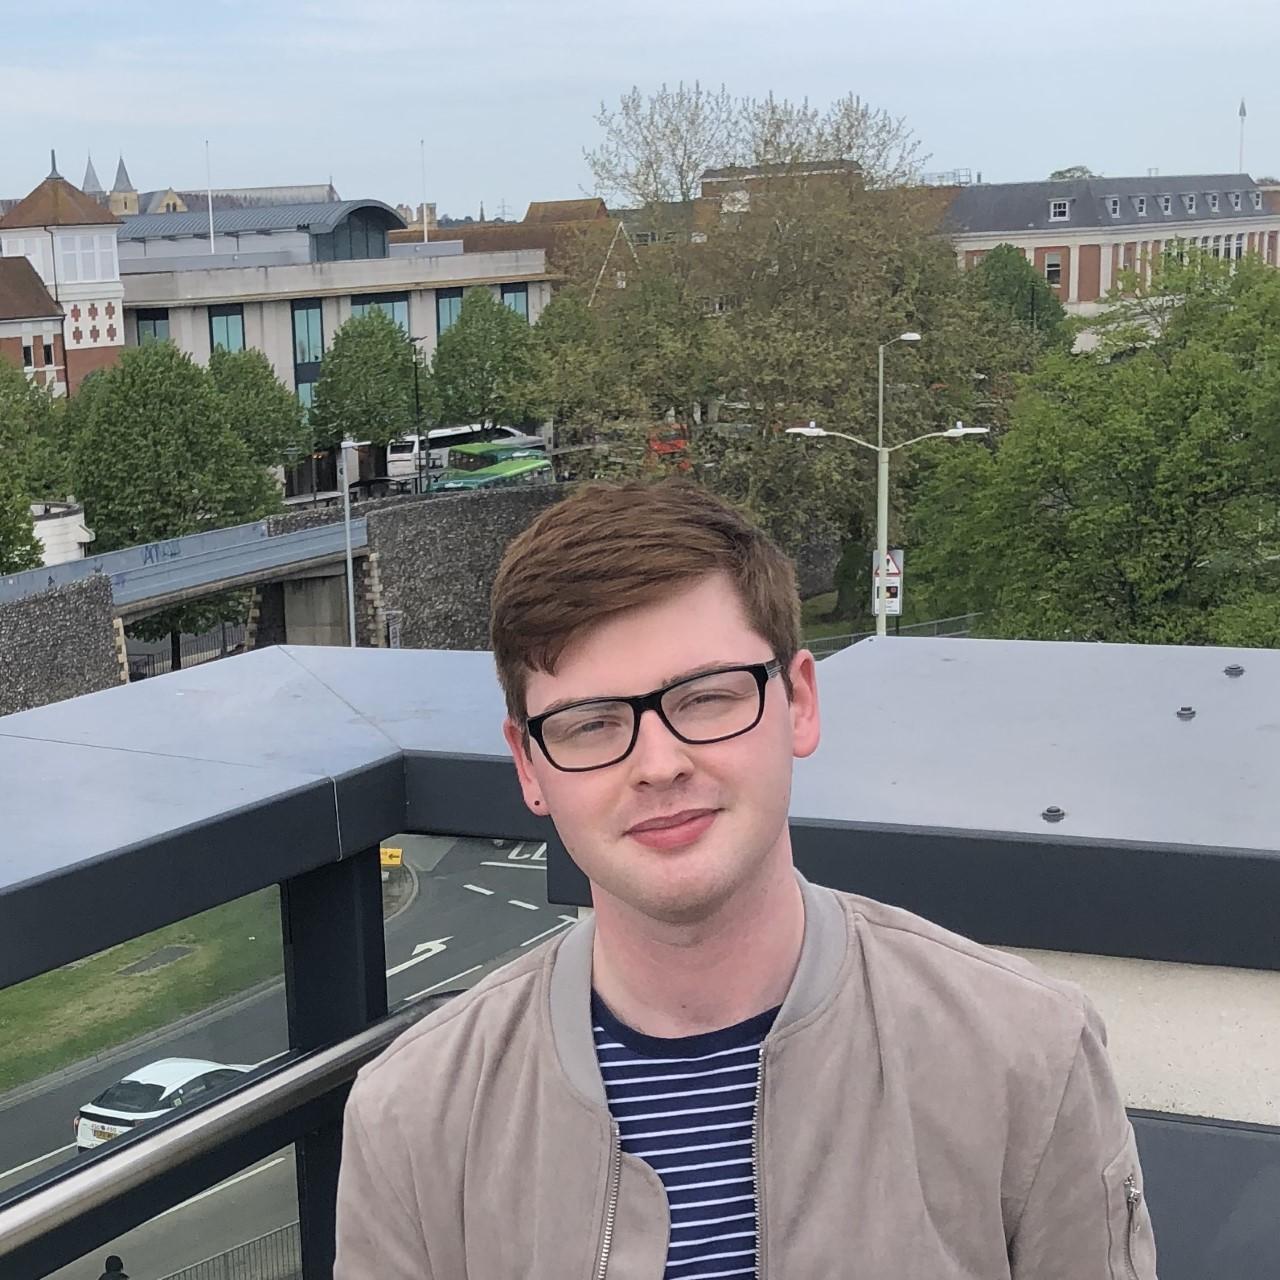 Politics and IR Graduates - Where are they now? John Smith, Civil Service